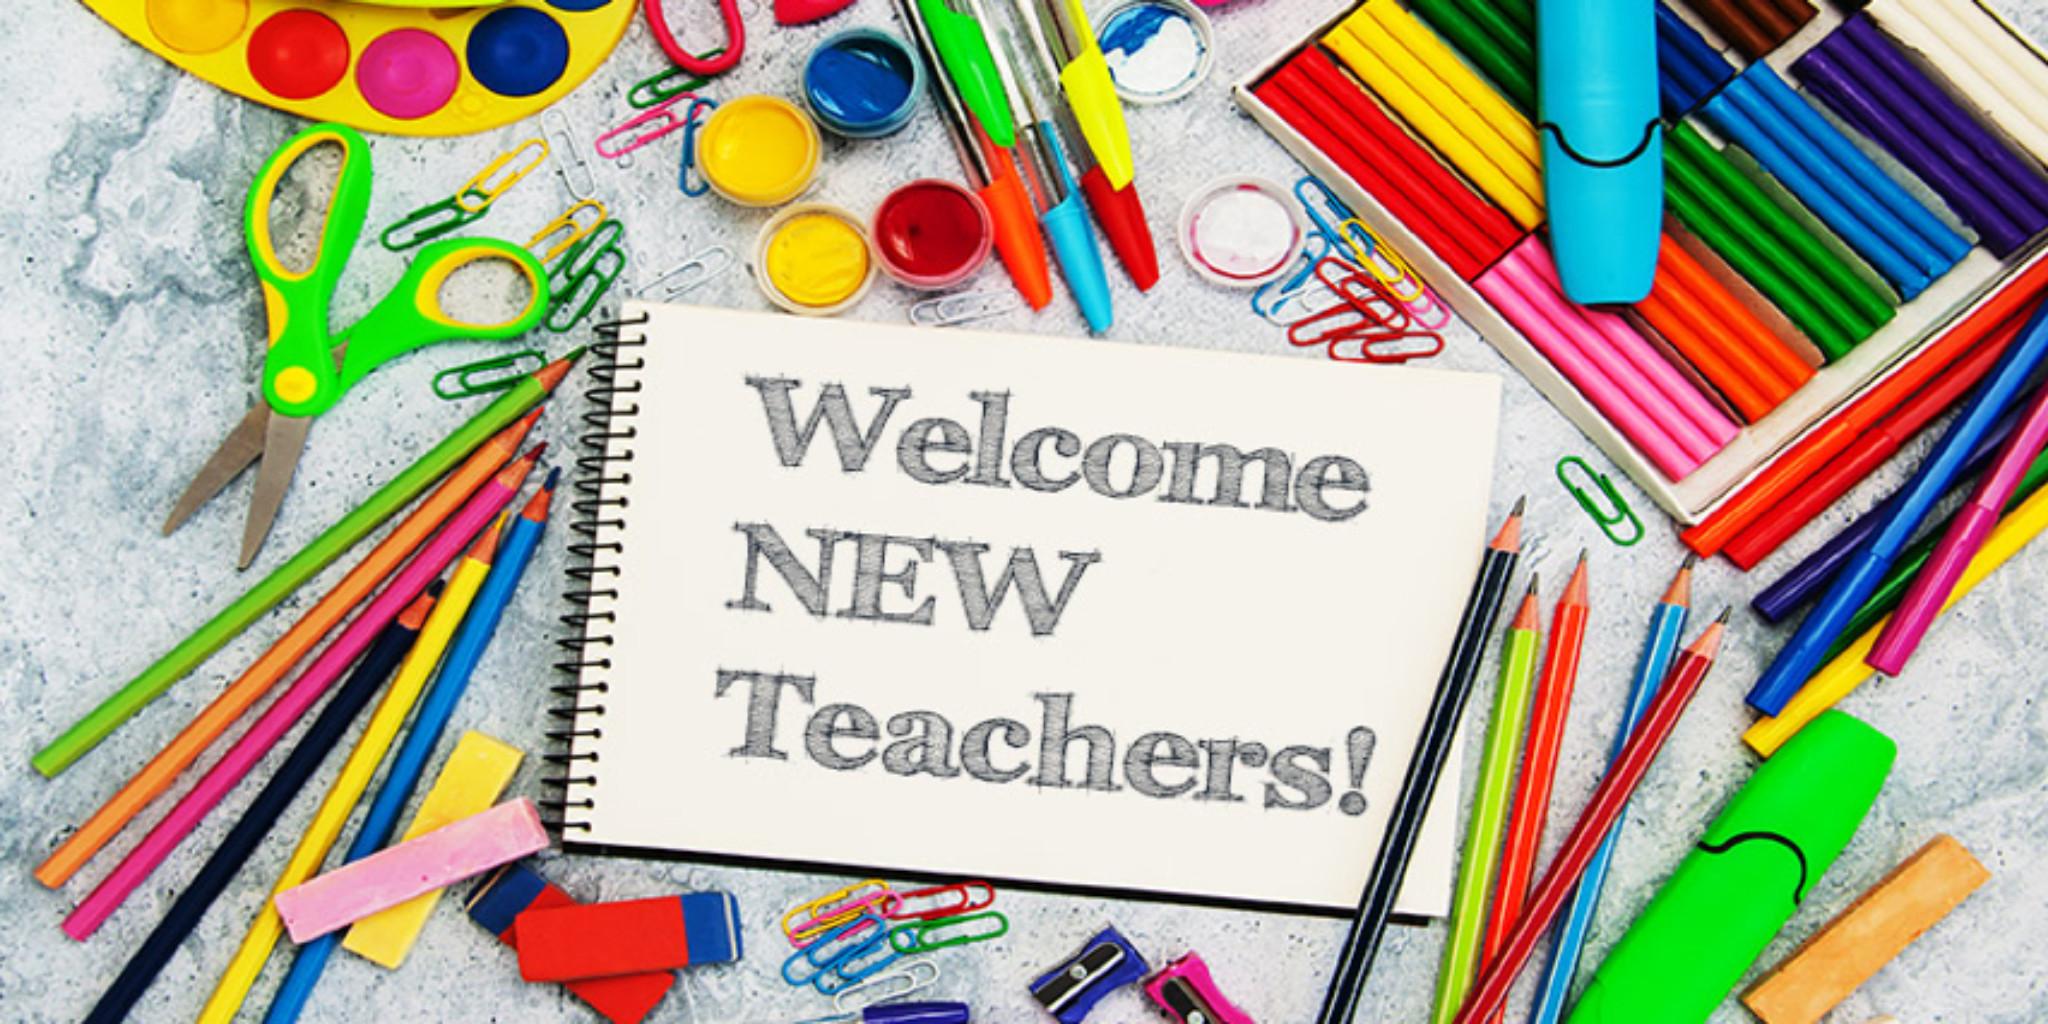 New Elementary Teachers bowl icon